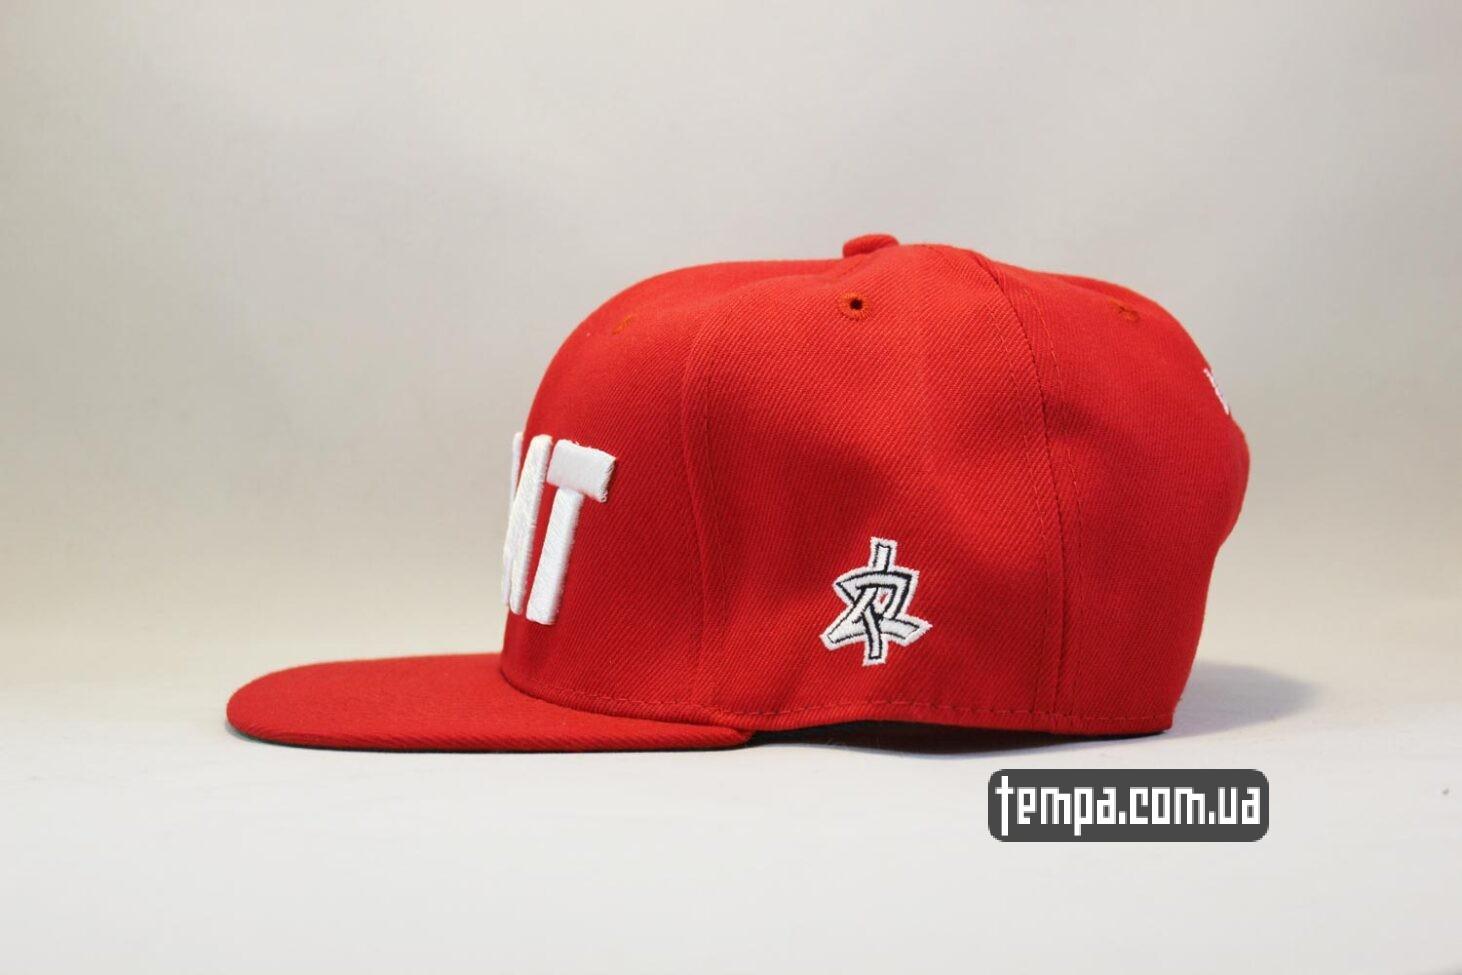 жирдяй жирный fat phat кепка Snapback ASOS PHAT Red красная бейсболка